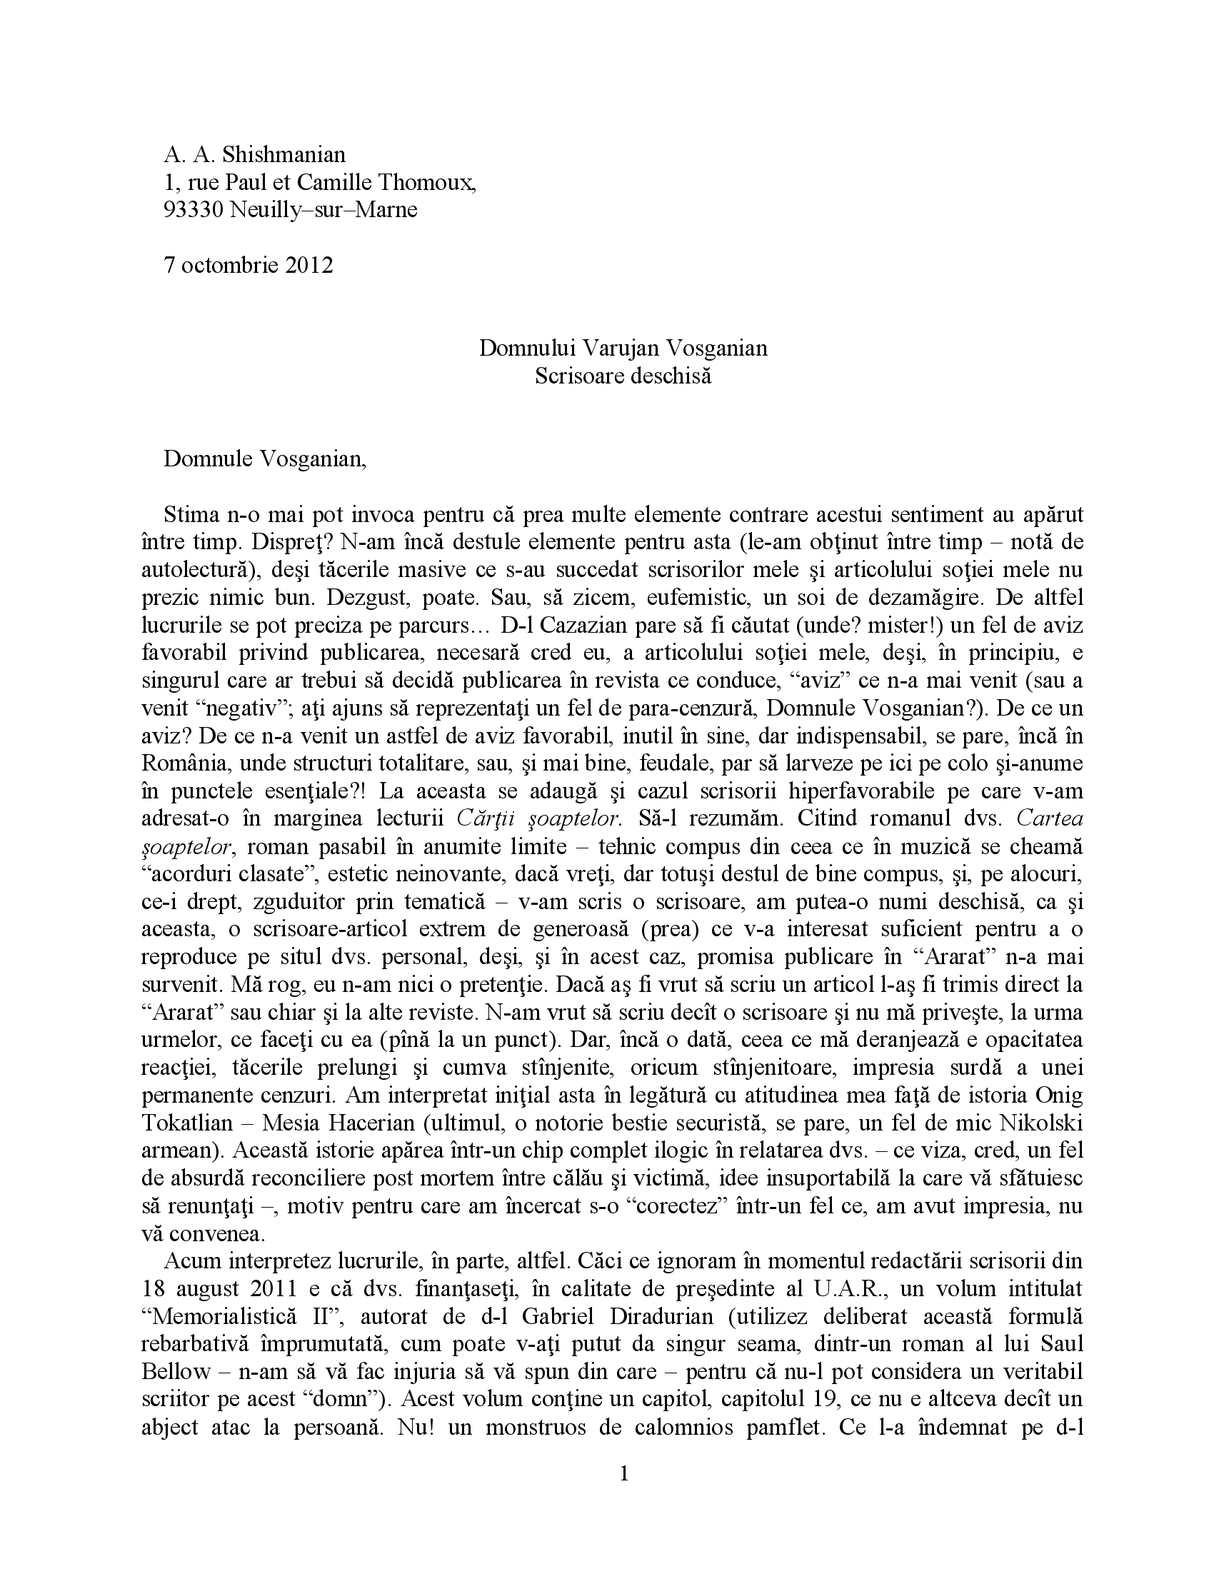 Poșta de scrisori internațională | Posta Moldovei